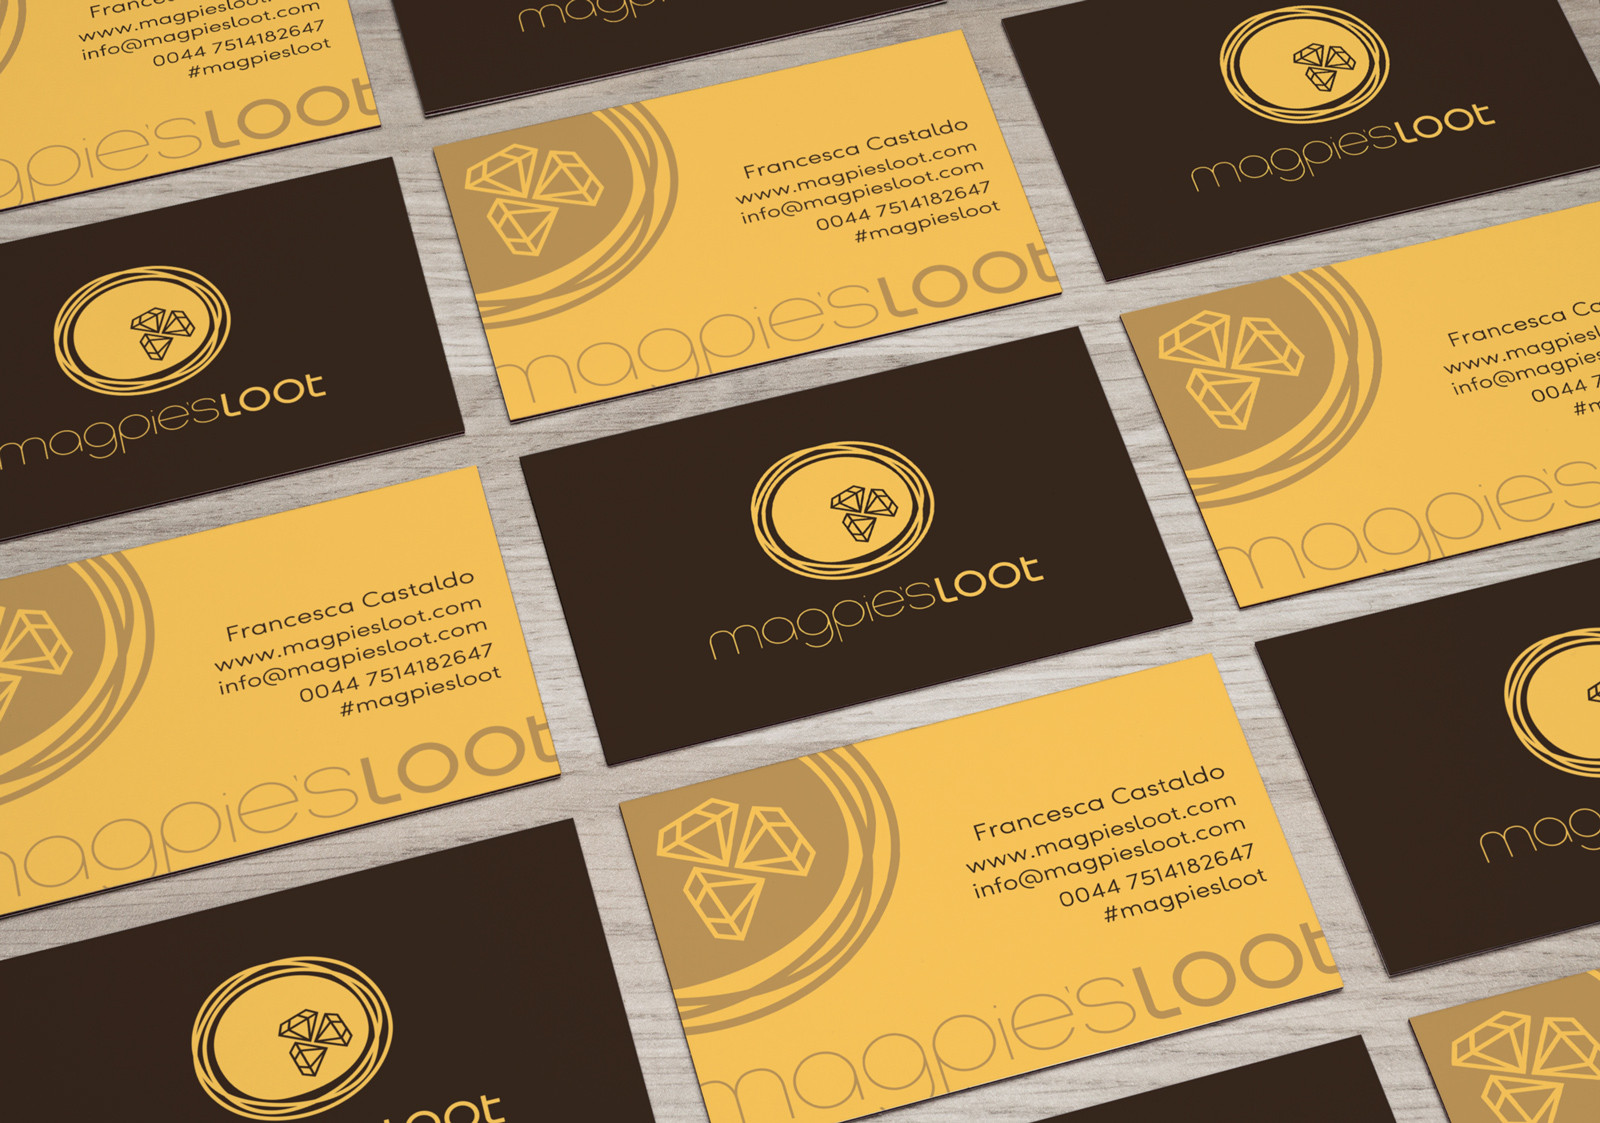 magpies-loot-business-card-design-martin